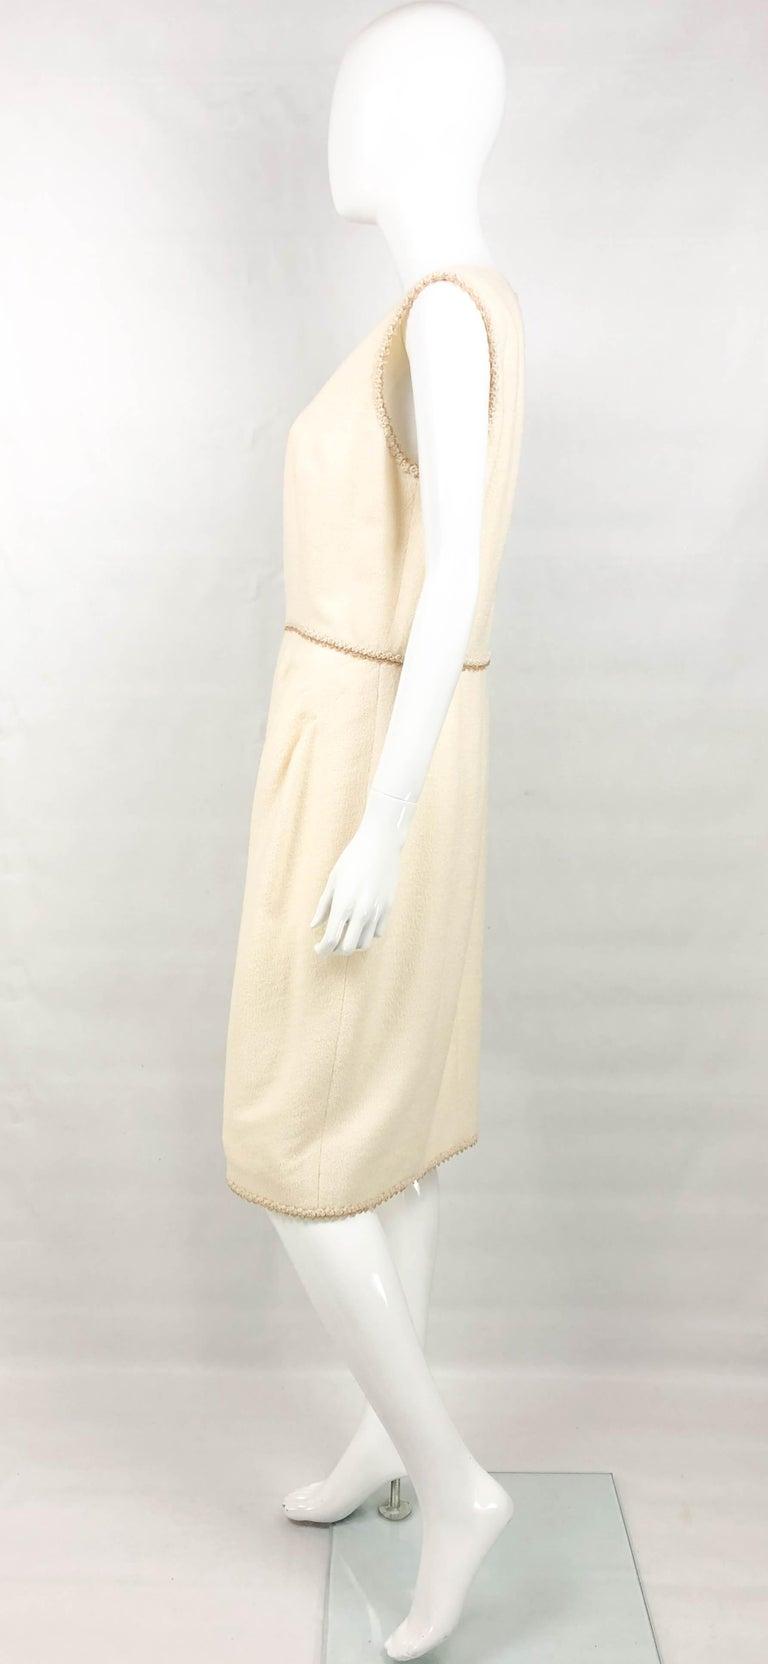 2010 Unworn Chanel Runway Look Cream Dress With Gold Thread Trim For Sale 3